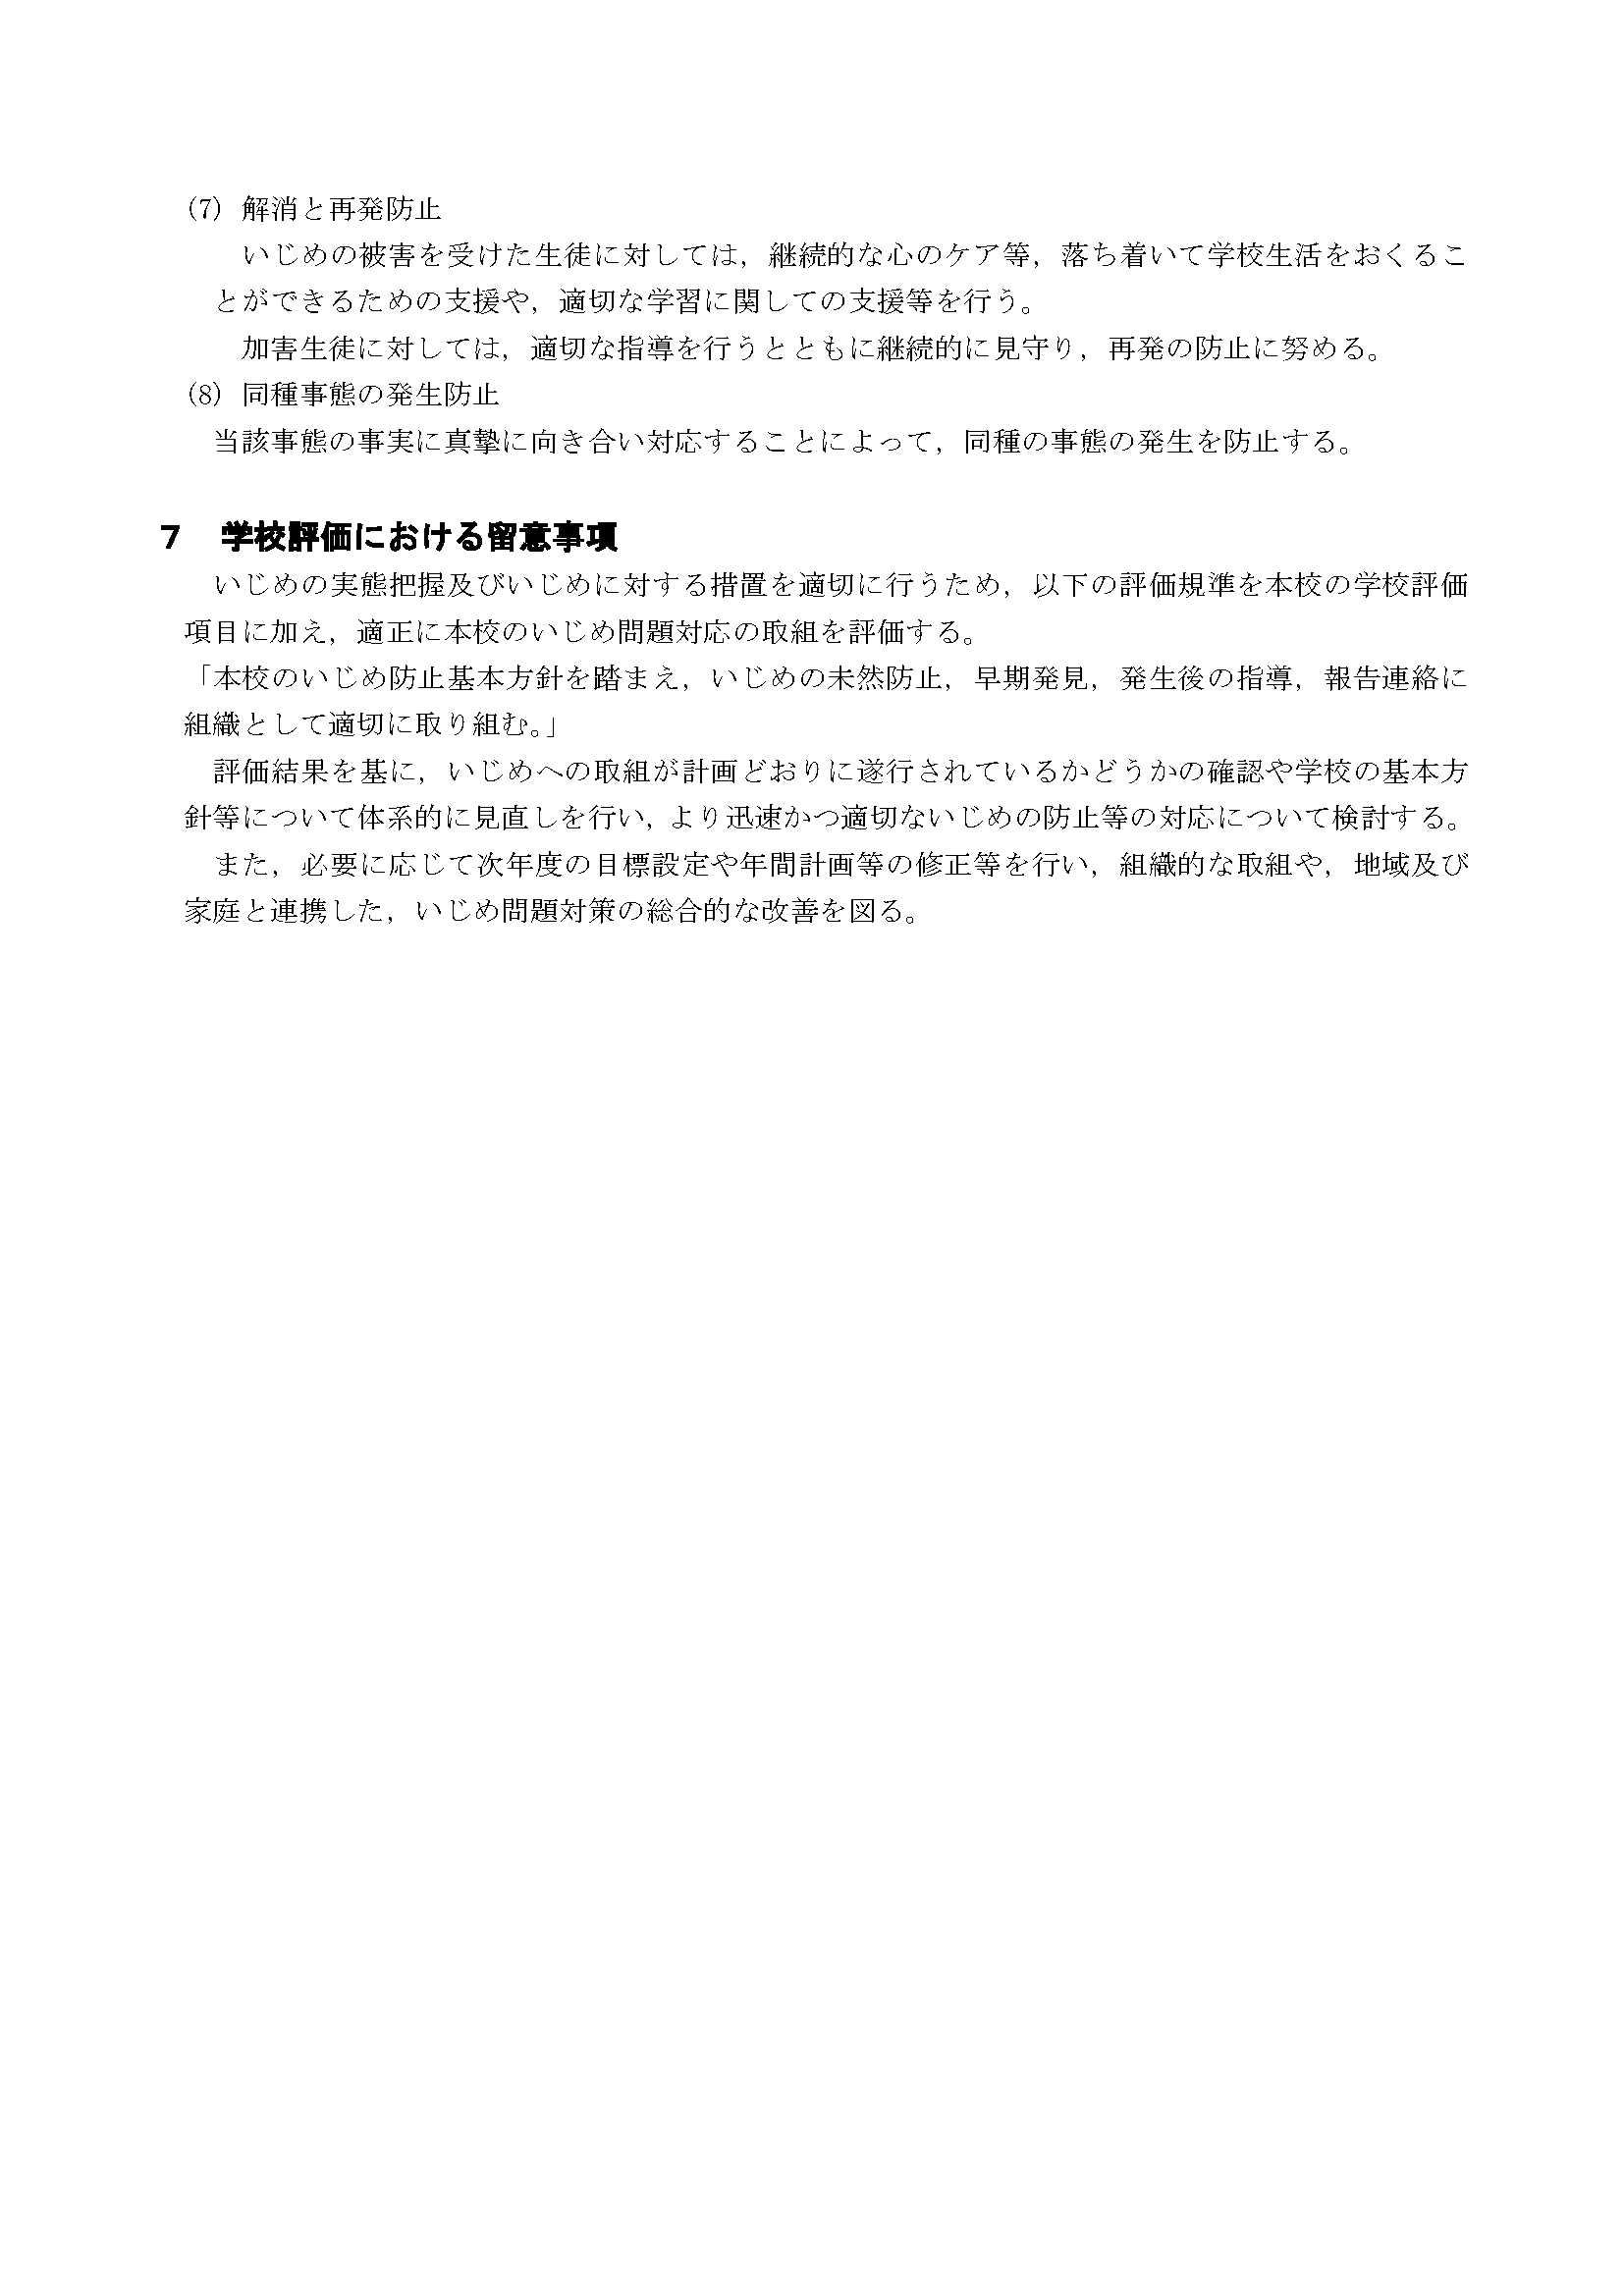 H31潮来市立牛堀中学校いじめ防止基本方針(H31改訂)_10